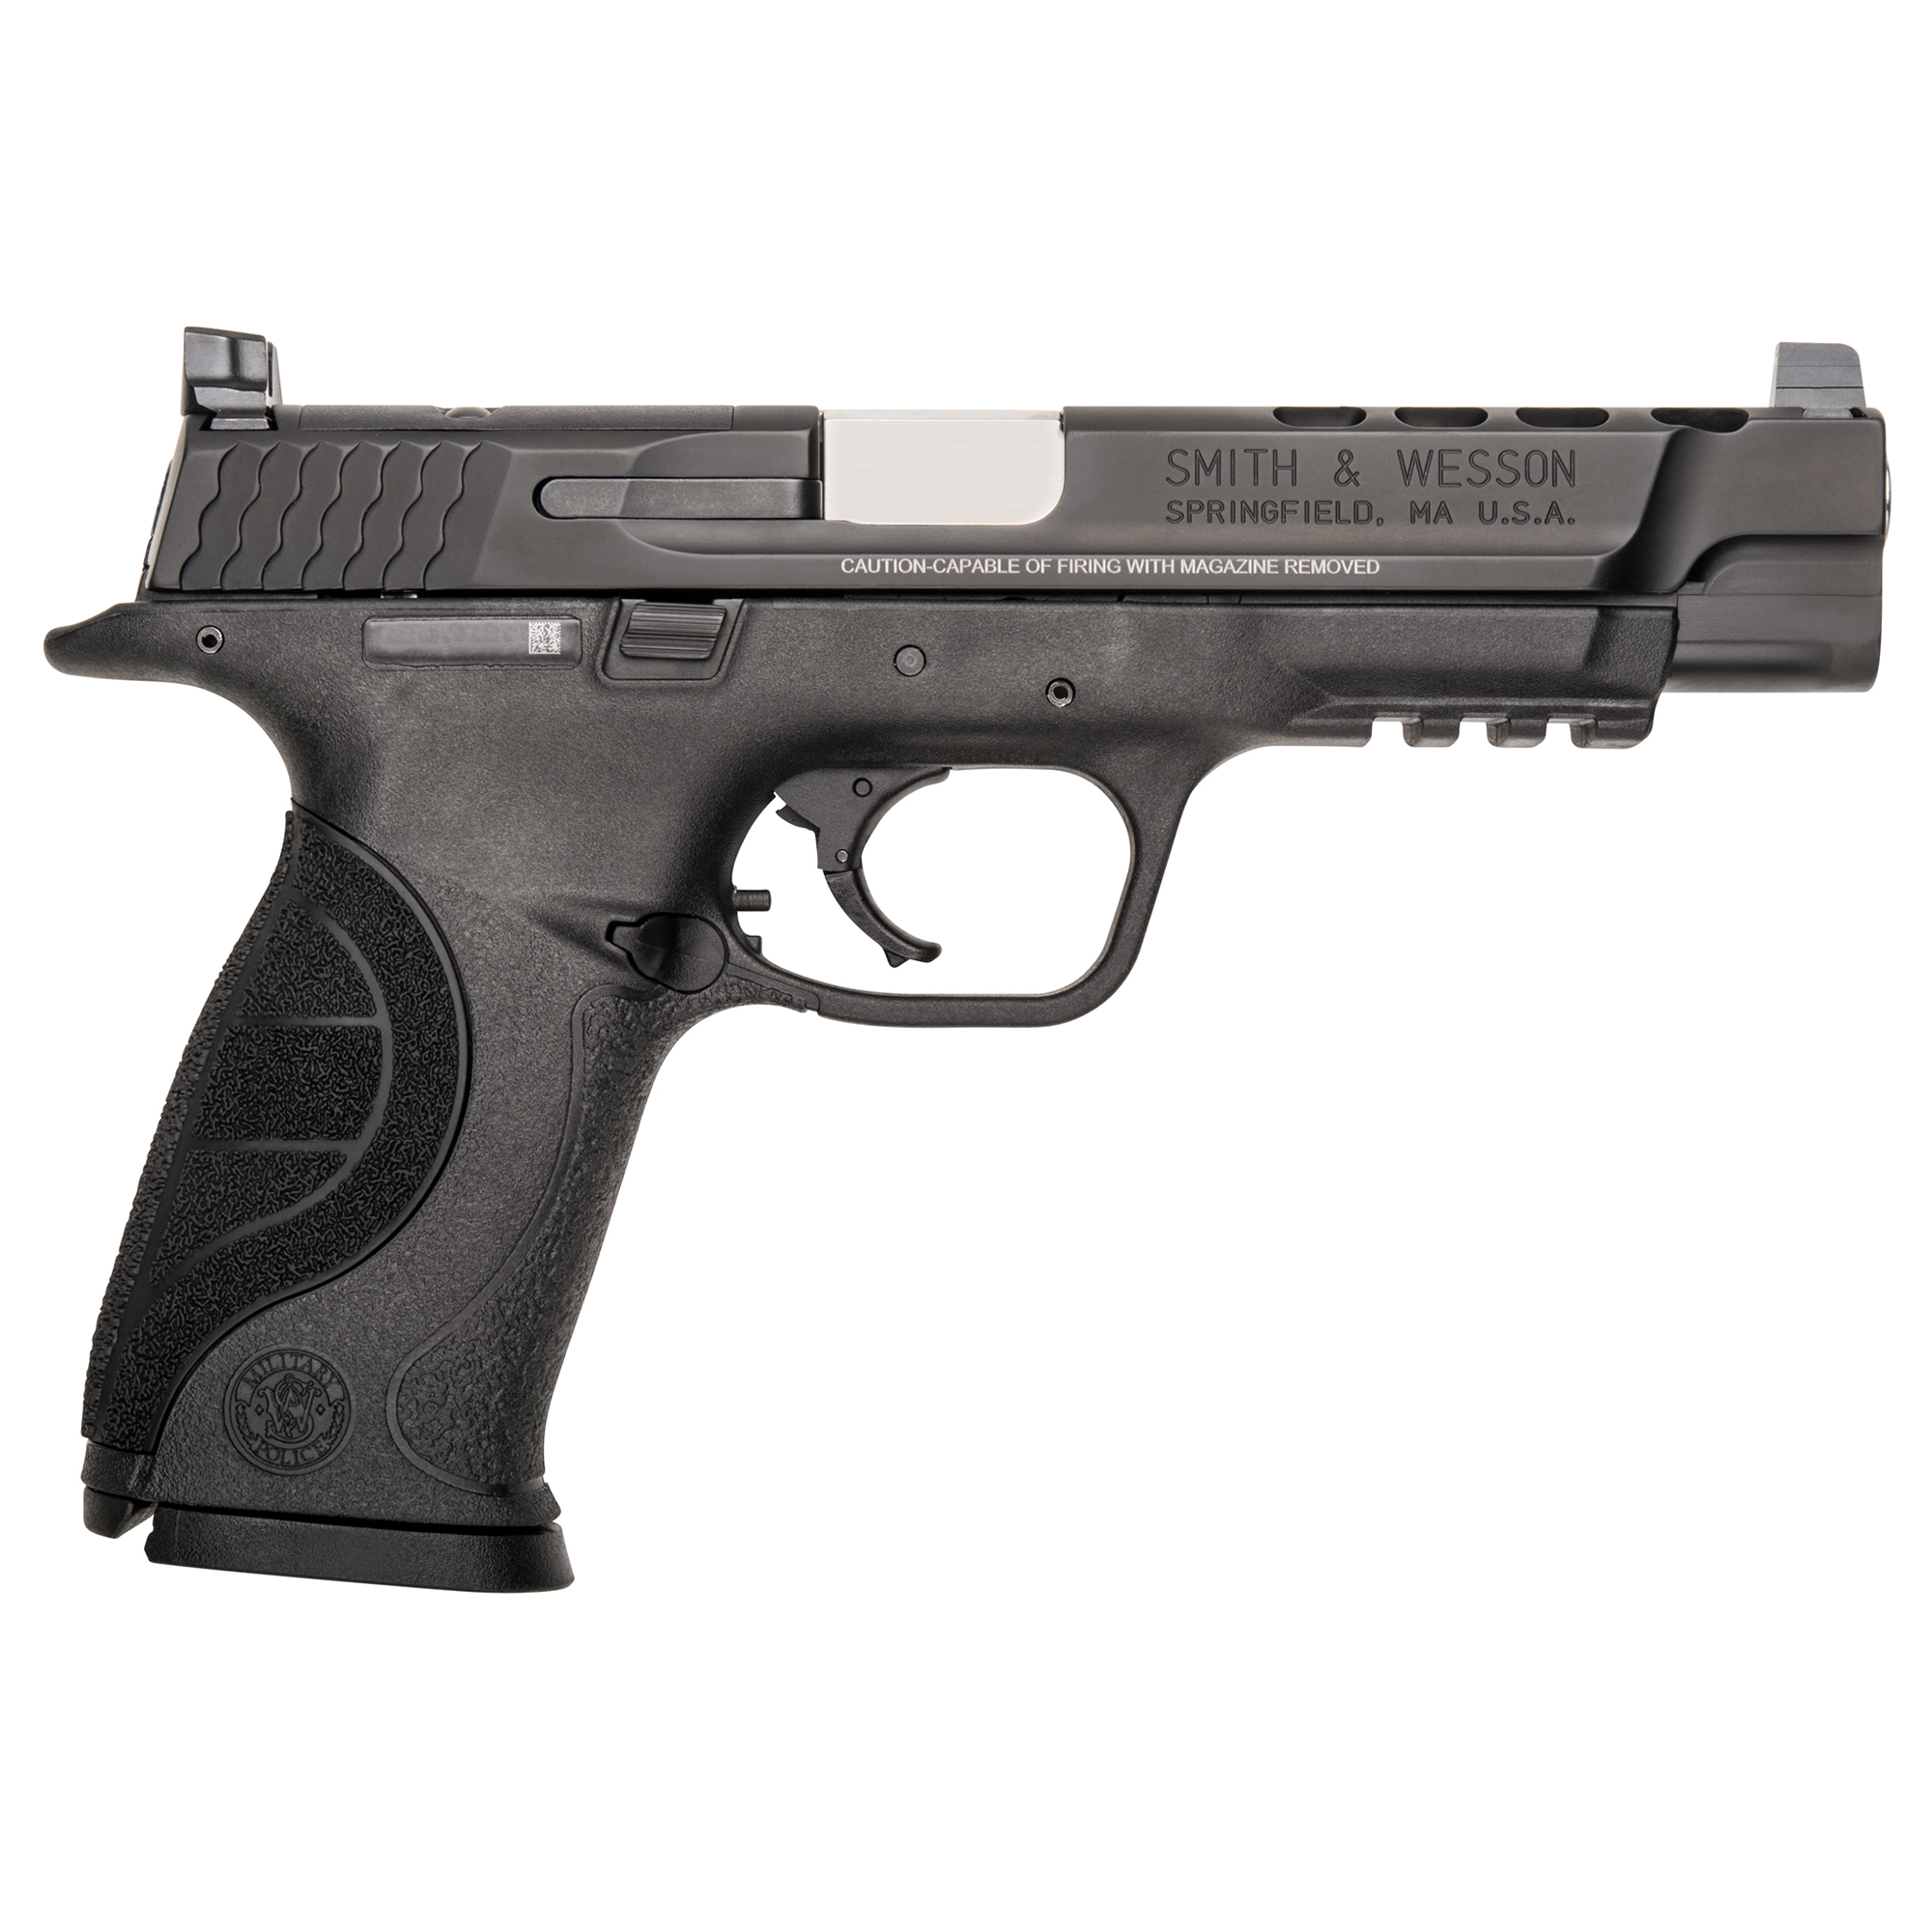 Smith & Wesson M & P9 Performance Center Ported Handgun